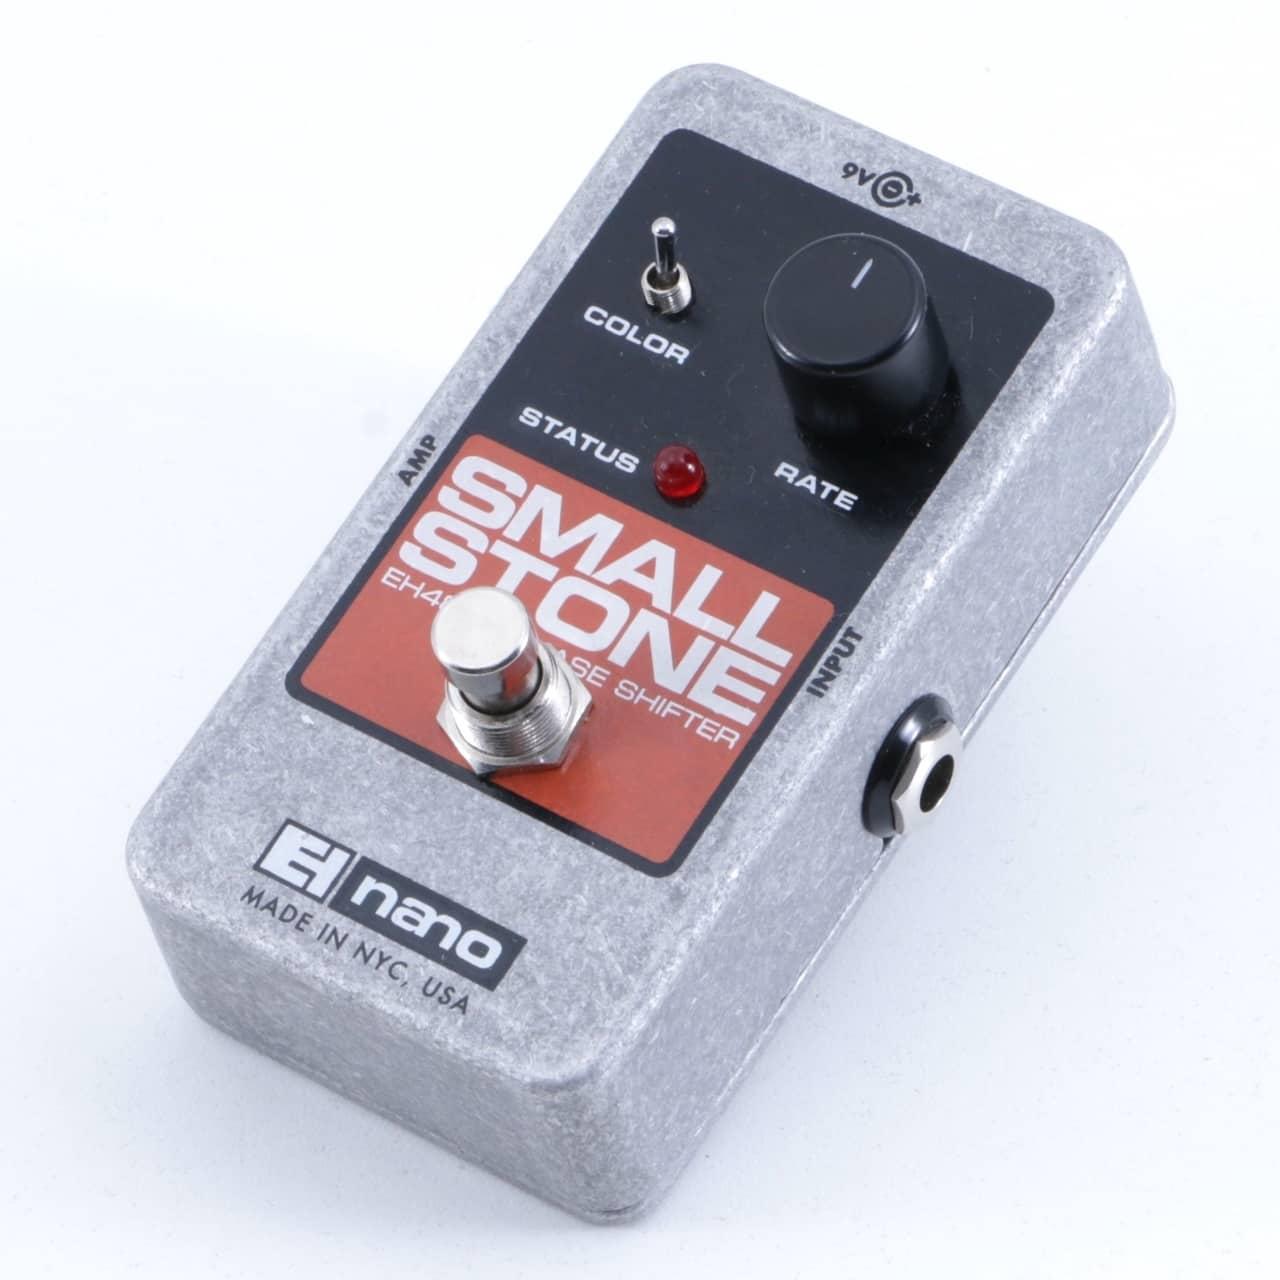 electro harmonix eh4800 nano small stone phaser guitar reverb. Black Bedroom Furniture Sets. Home Design Ideas